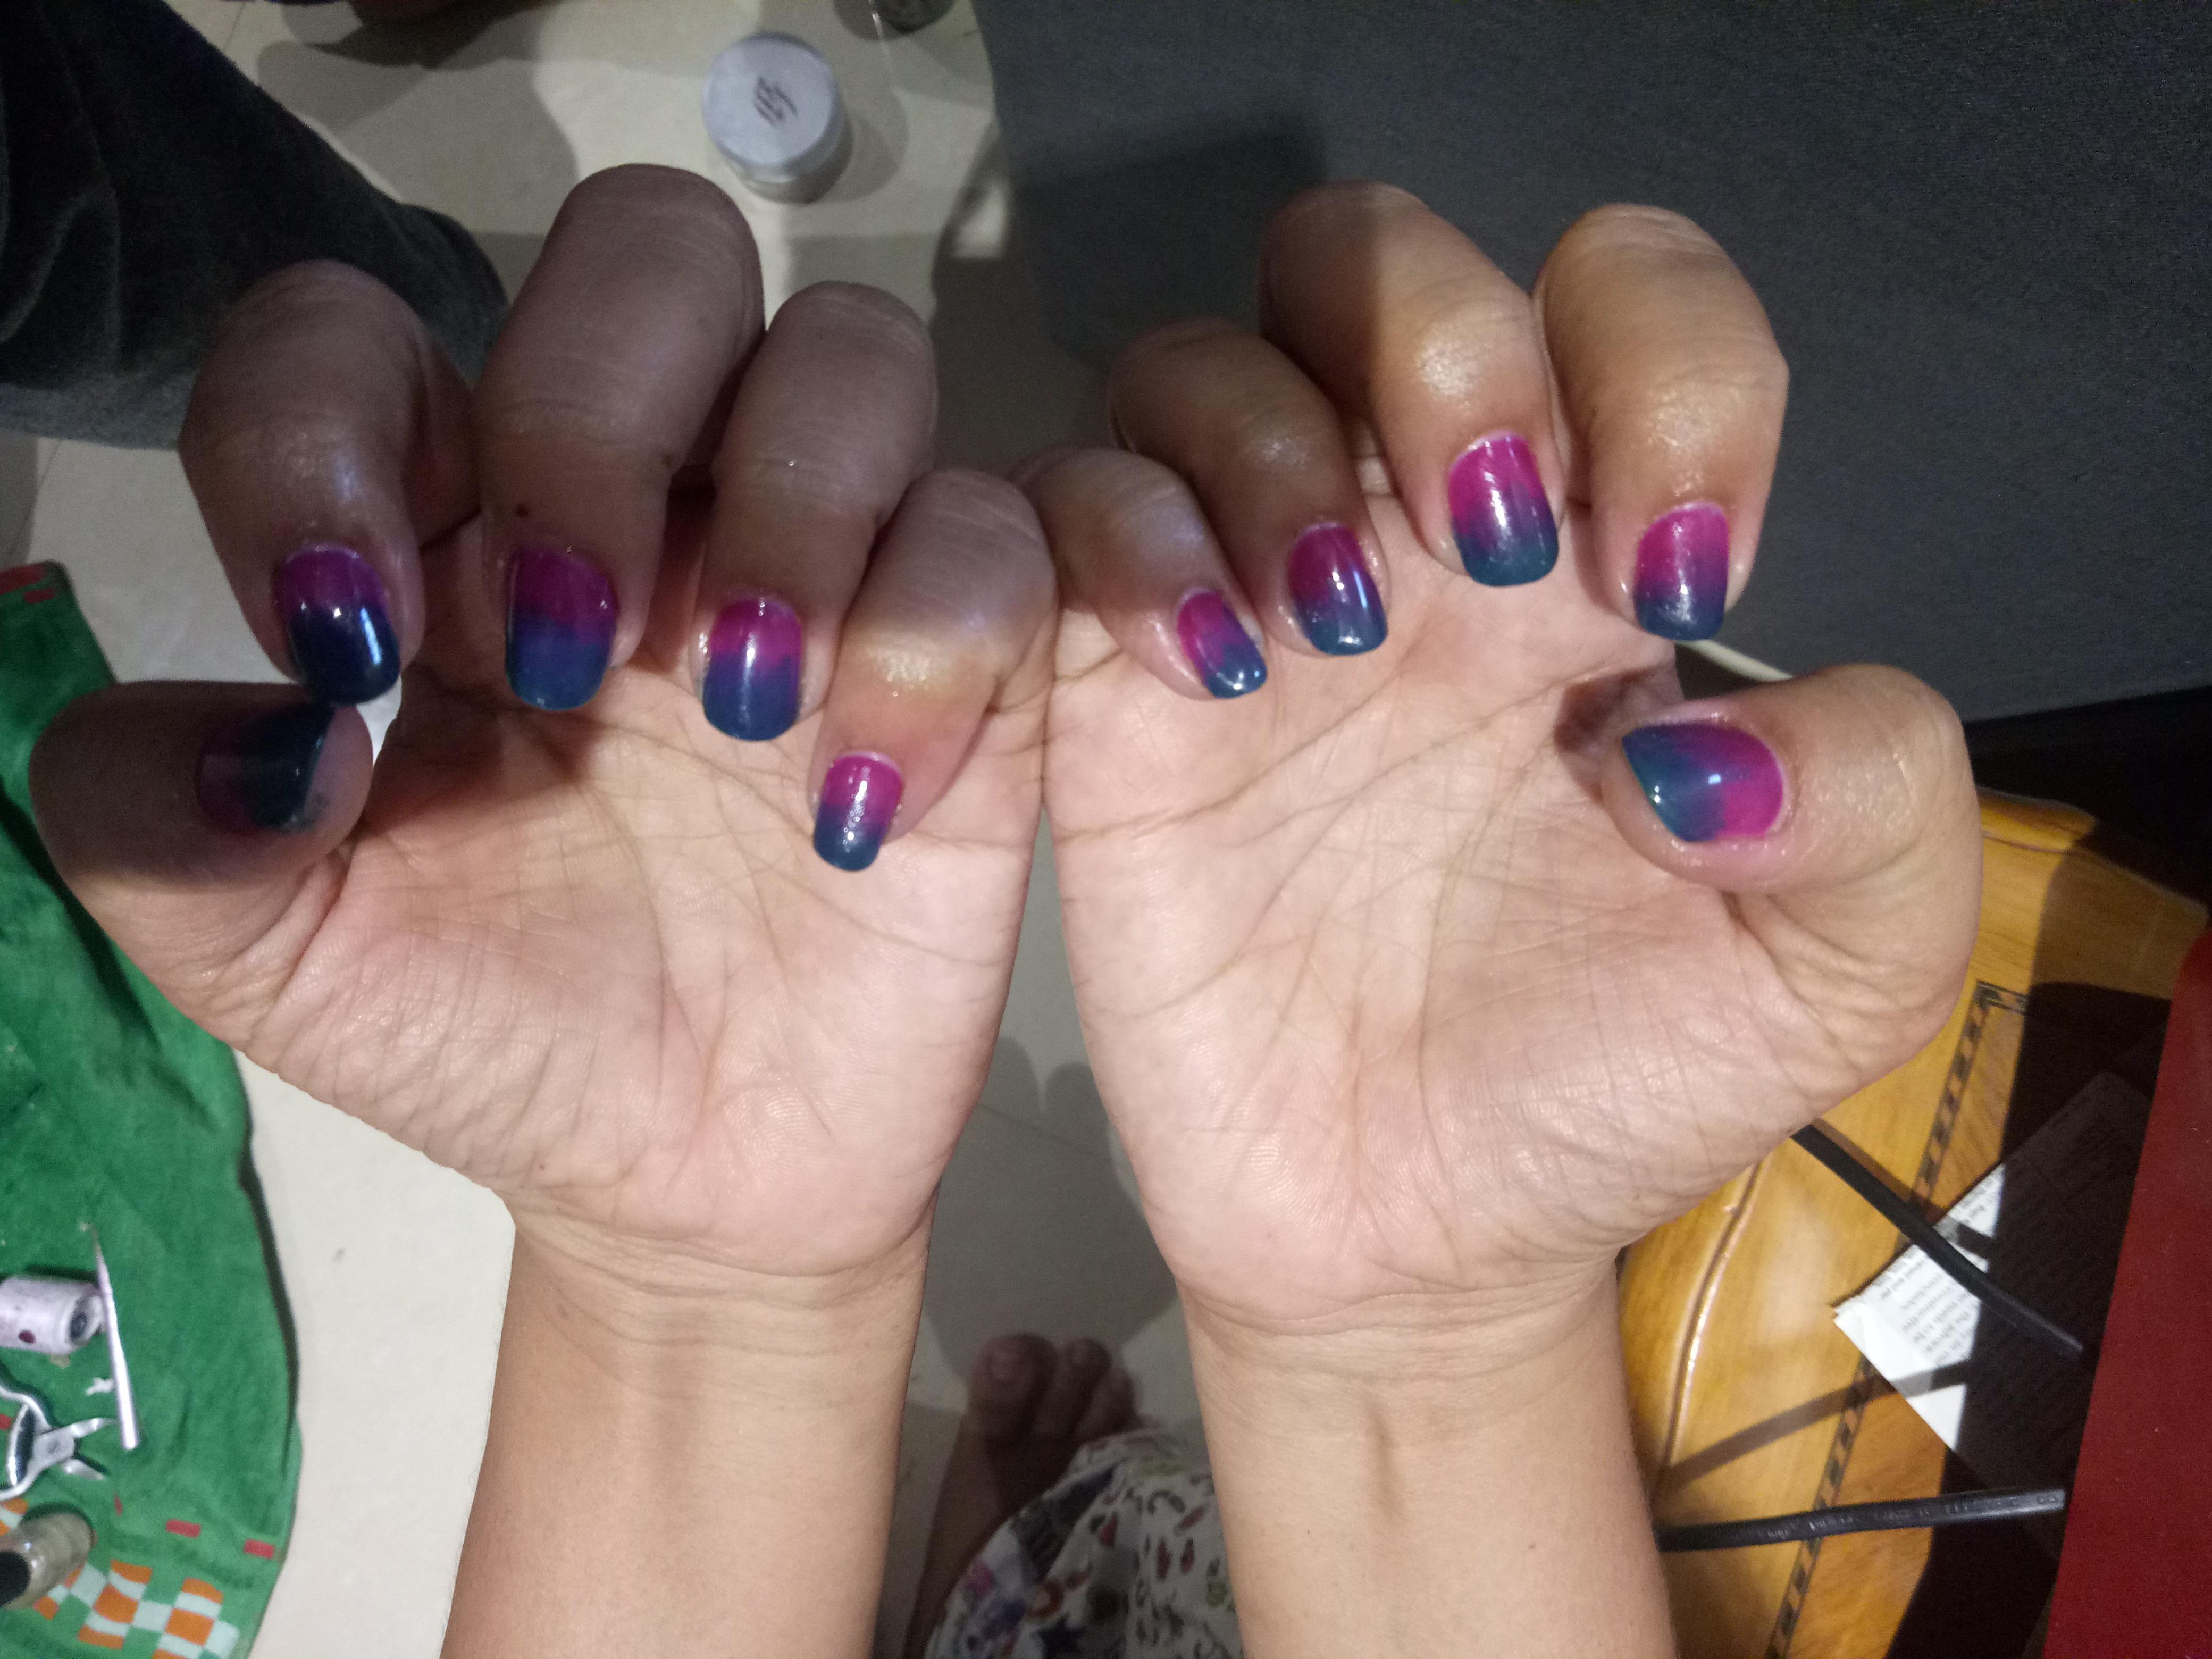 4f68a84a35c Top 20 Nail Spas in Malad West, Mumbai - Nail Salons in Mumbai - Justdial